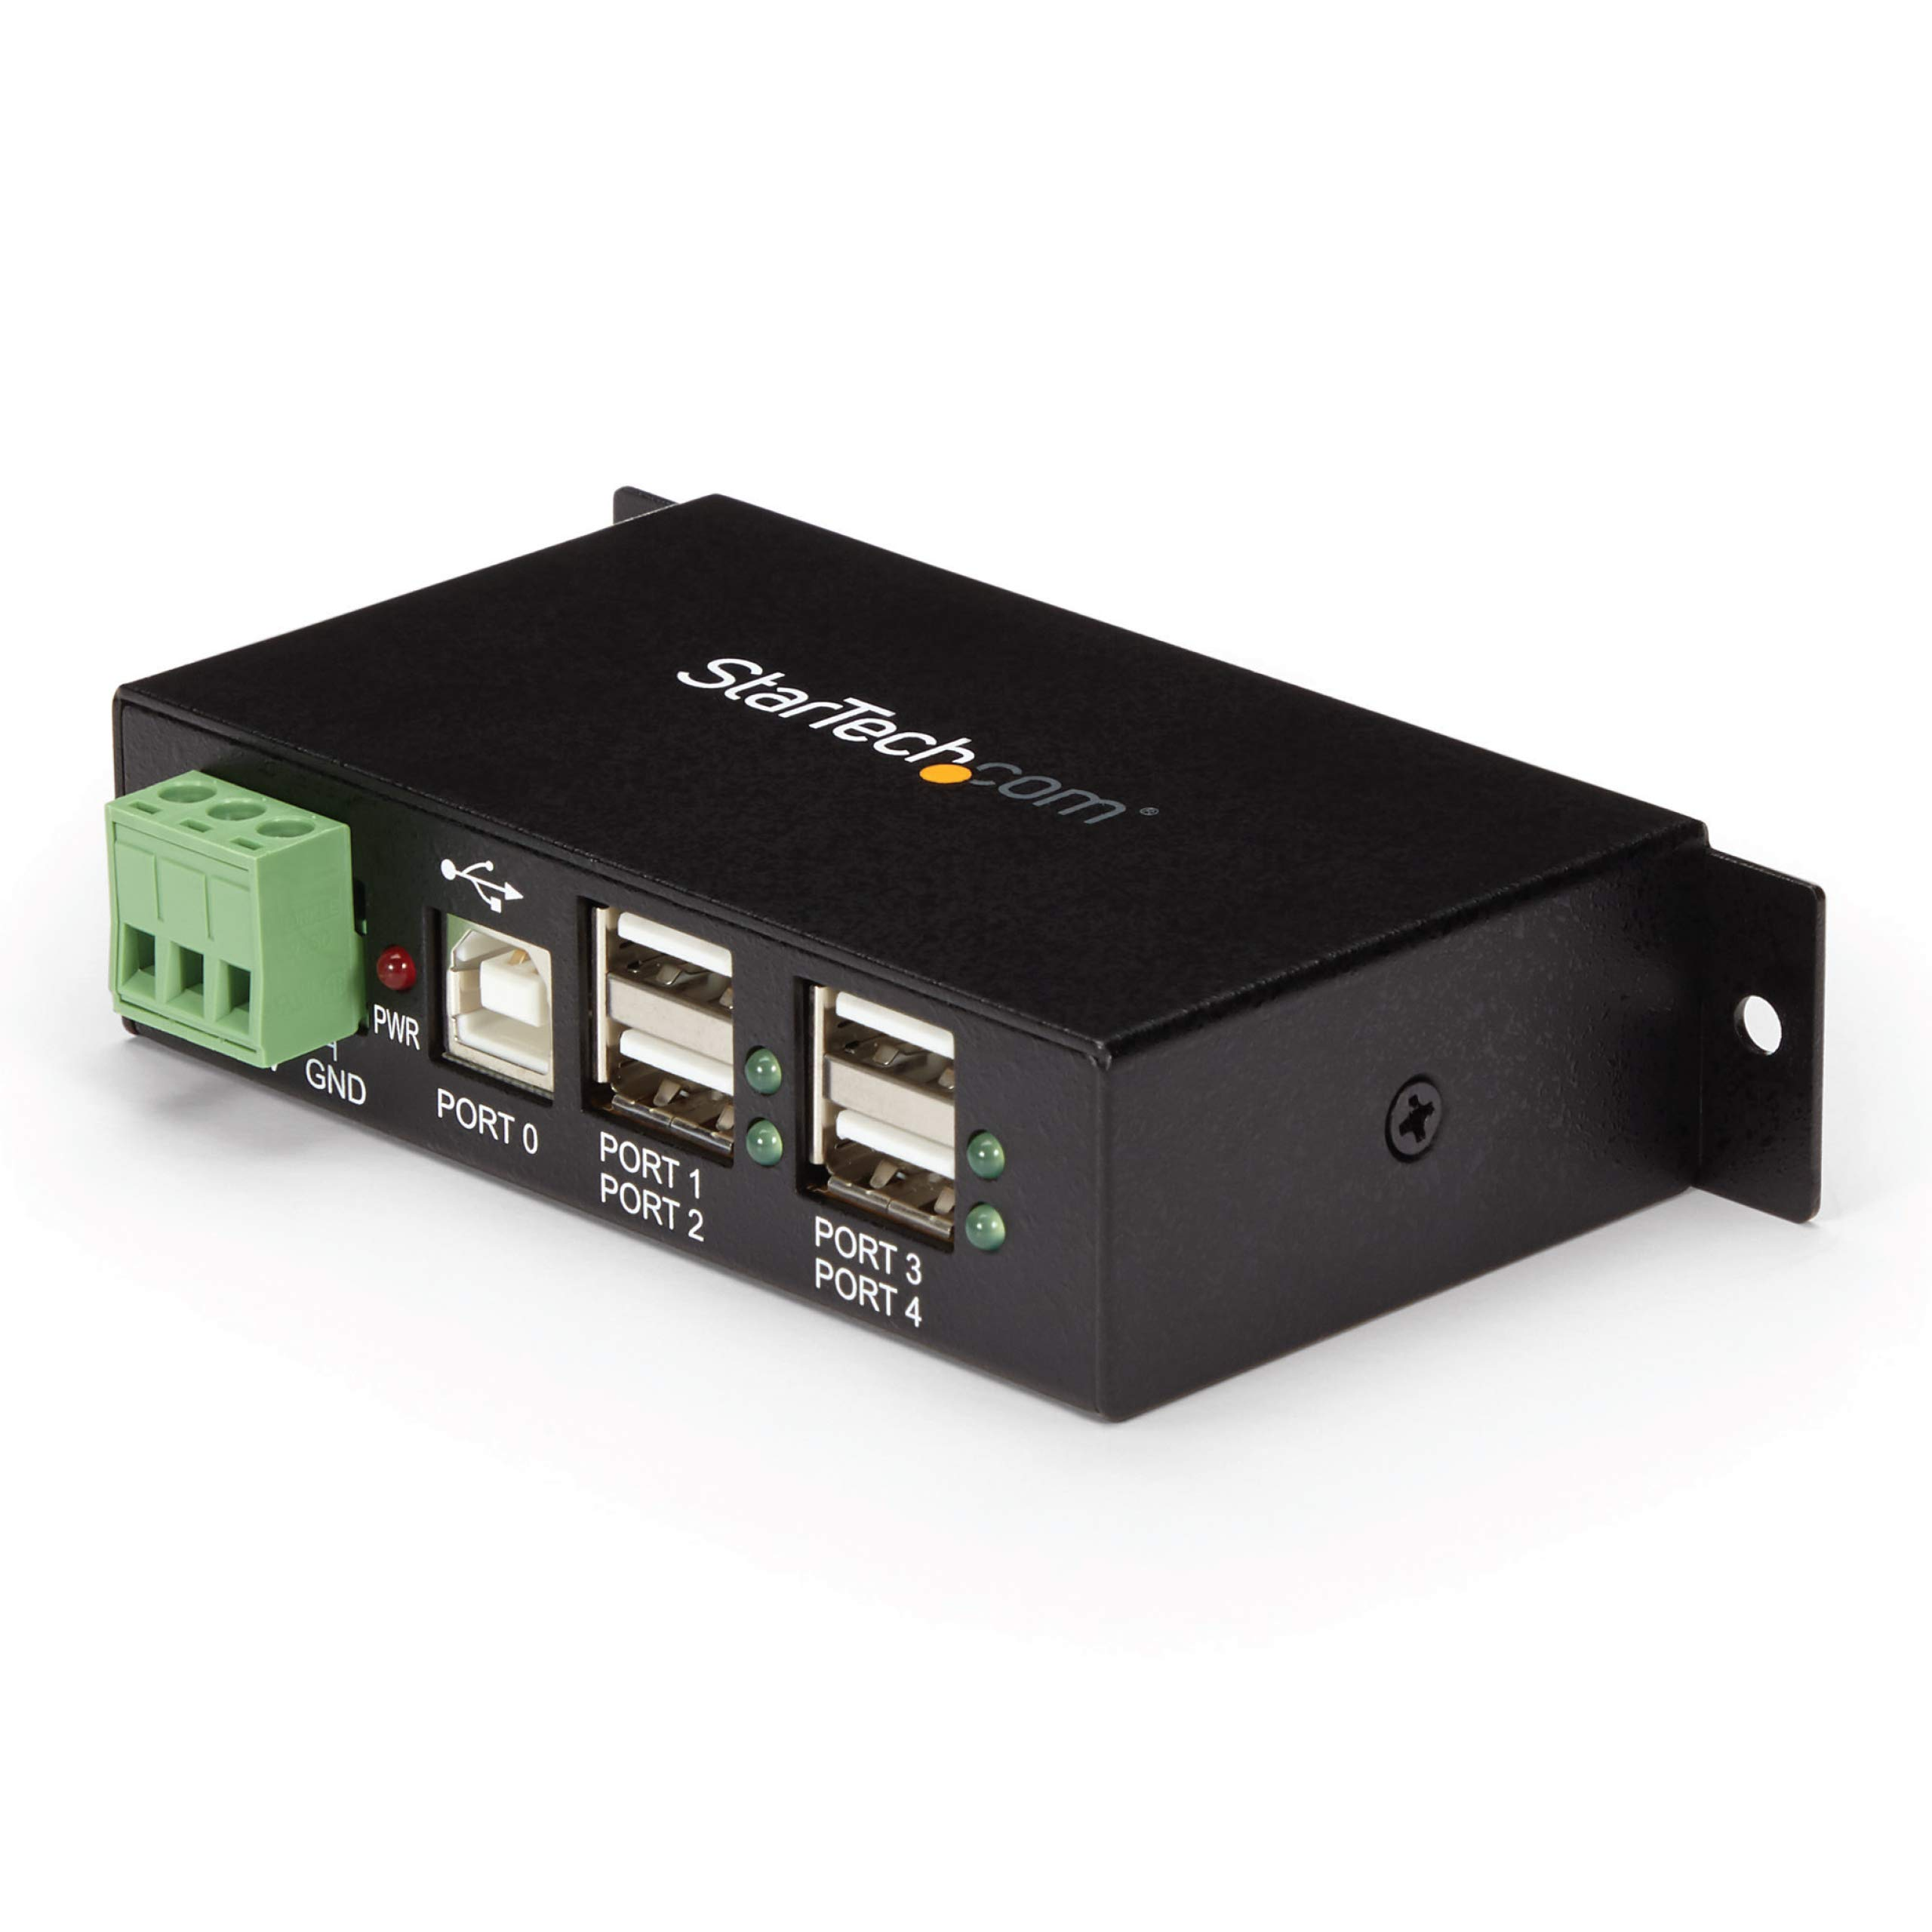 StarTech.com 4-Port Industrial USB 2.0 Hub with ESD Protection - Mountable - Multiport Hub (ST4200USBM)